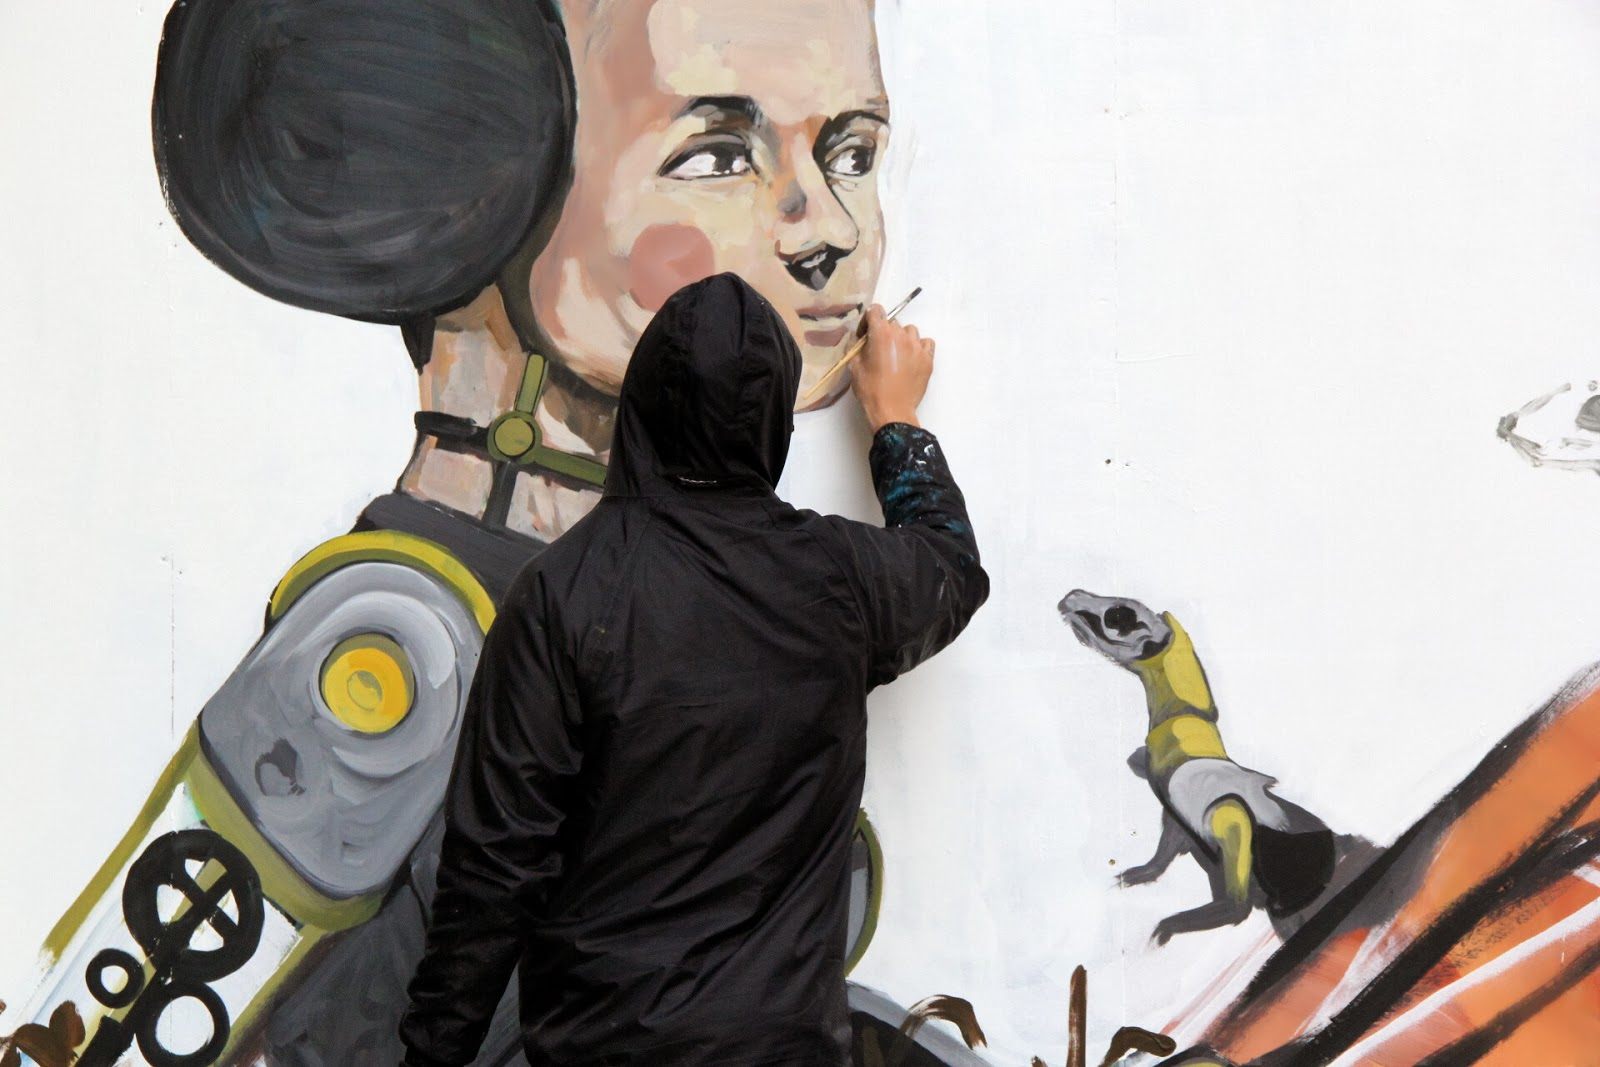 pixel-pancho-new-mural-in-shoreditch-london-02